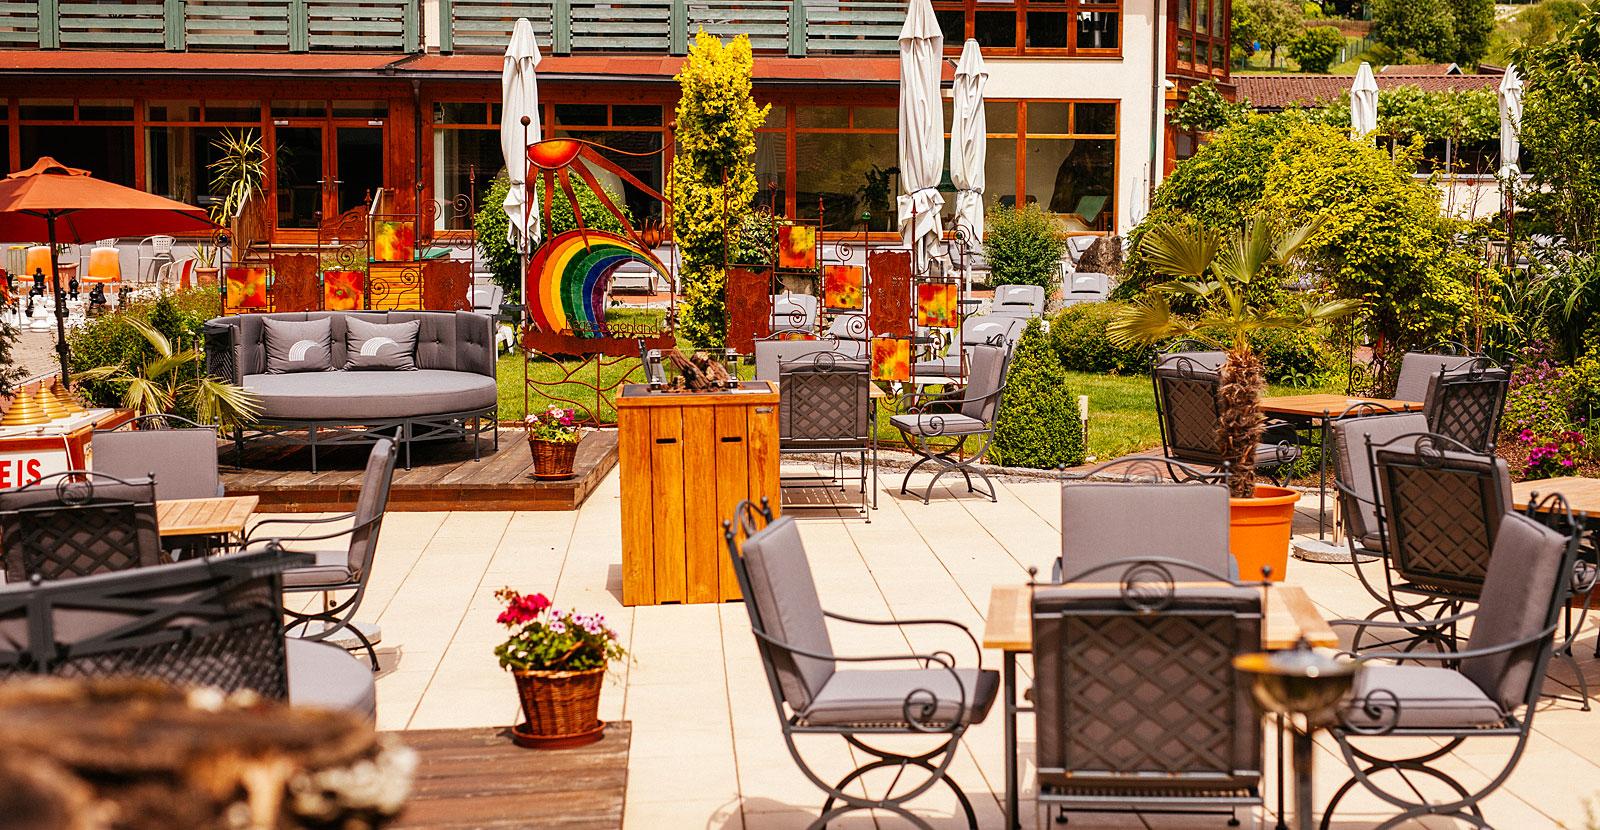 Erholung im Hotel Kramerwirt in Bayern